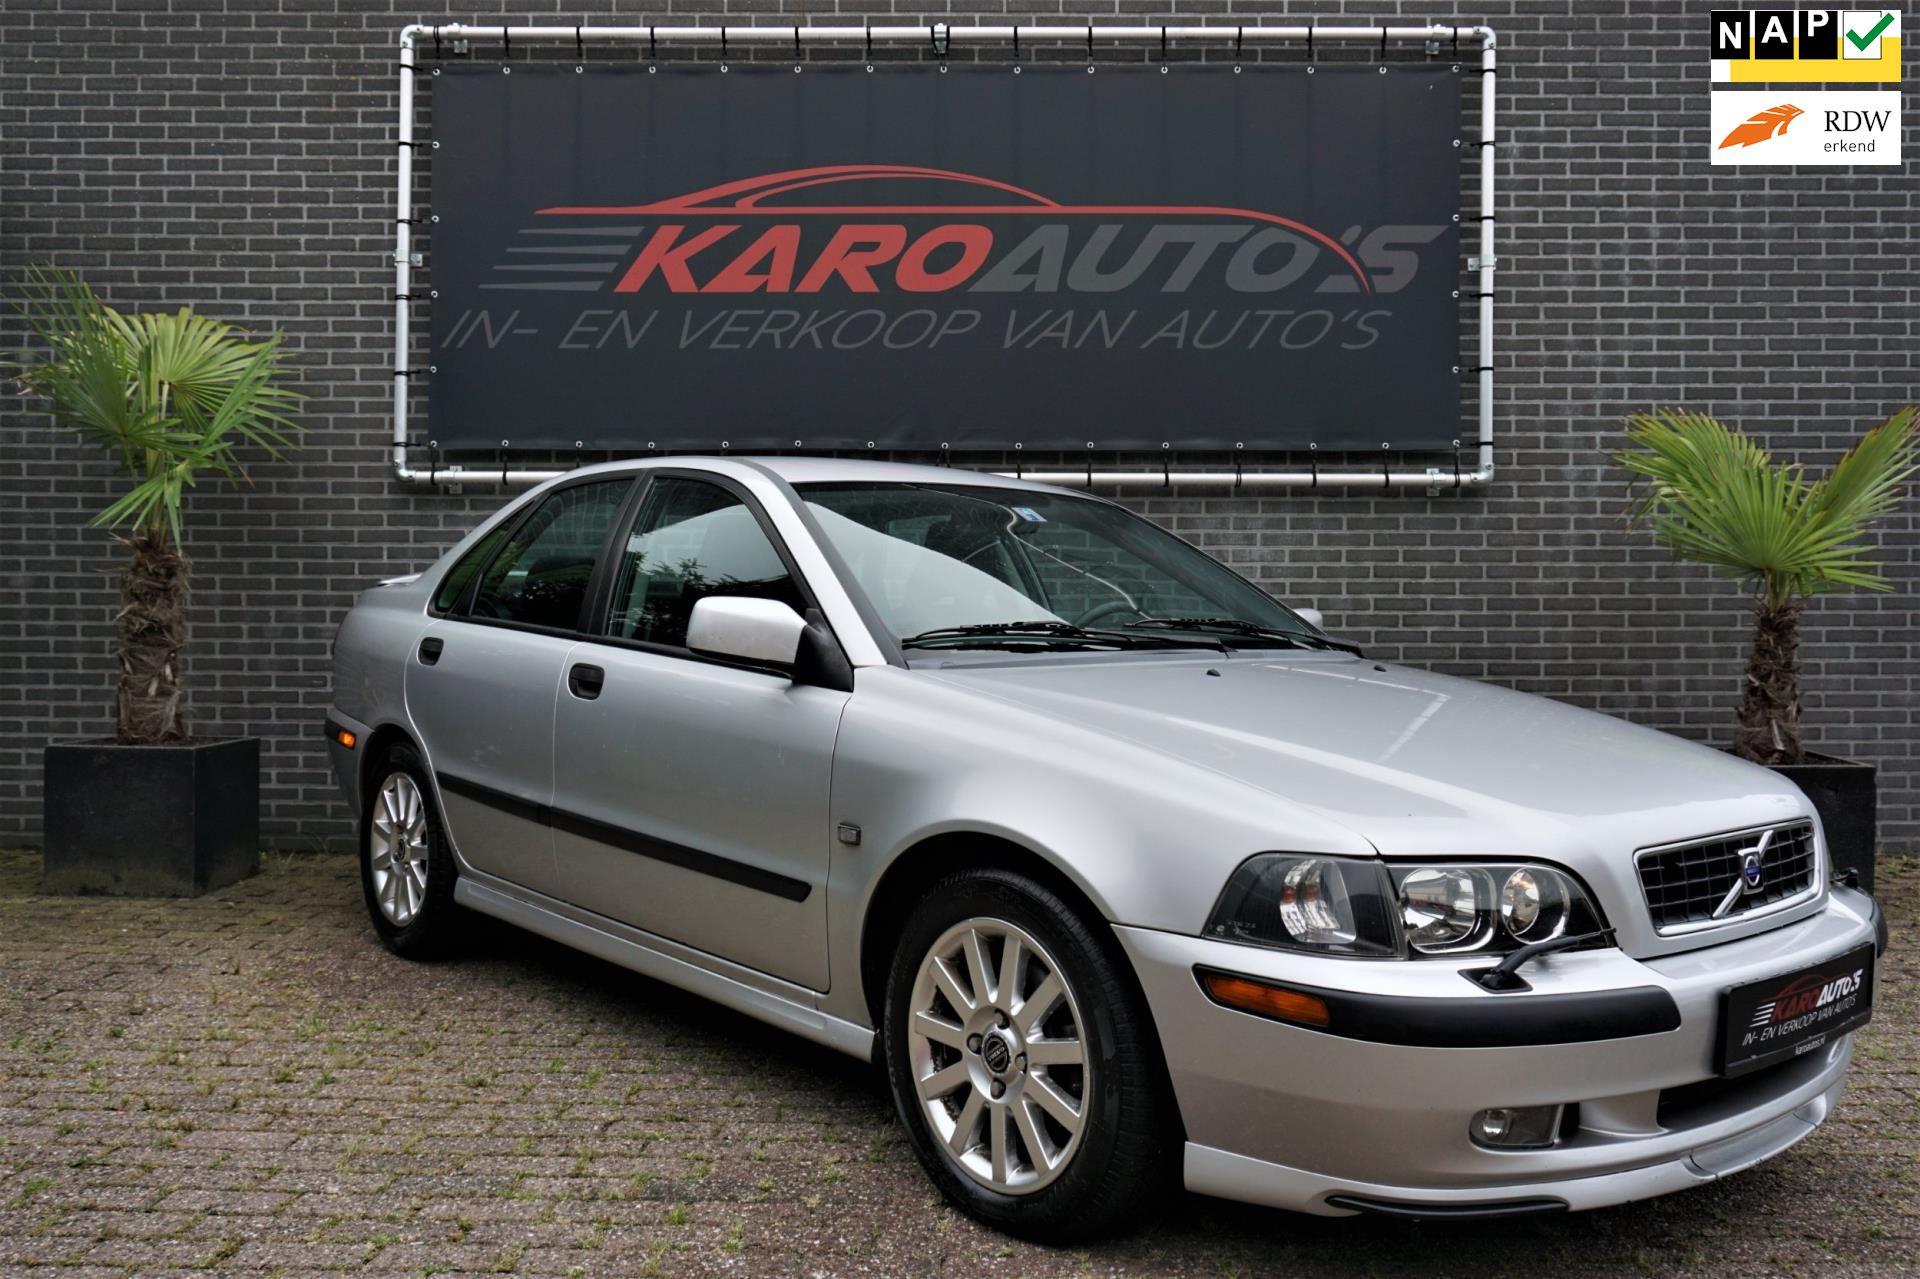 Volvo S40 occasion - KARO Auto's